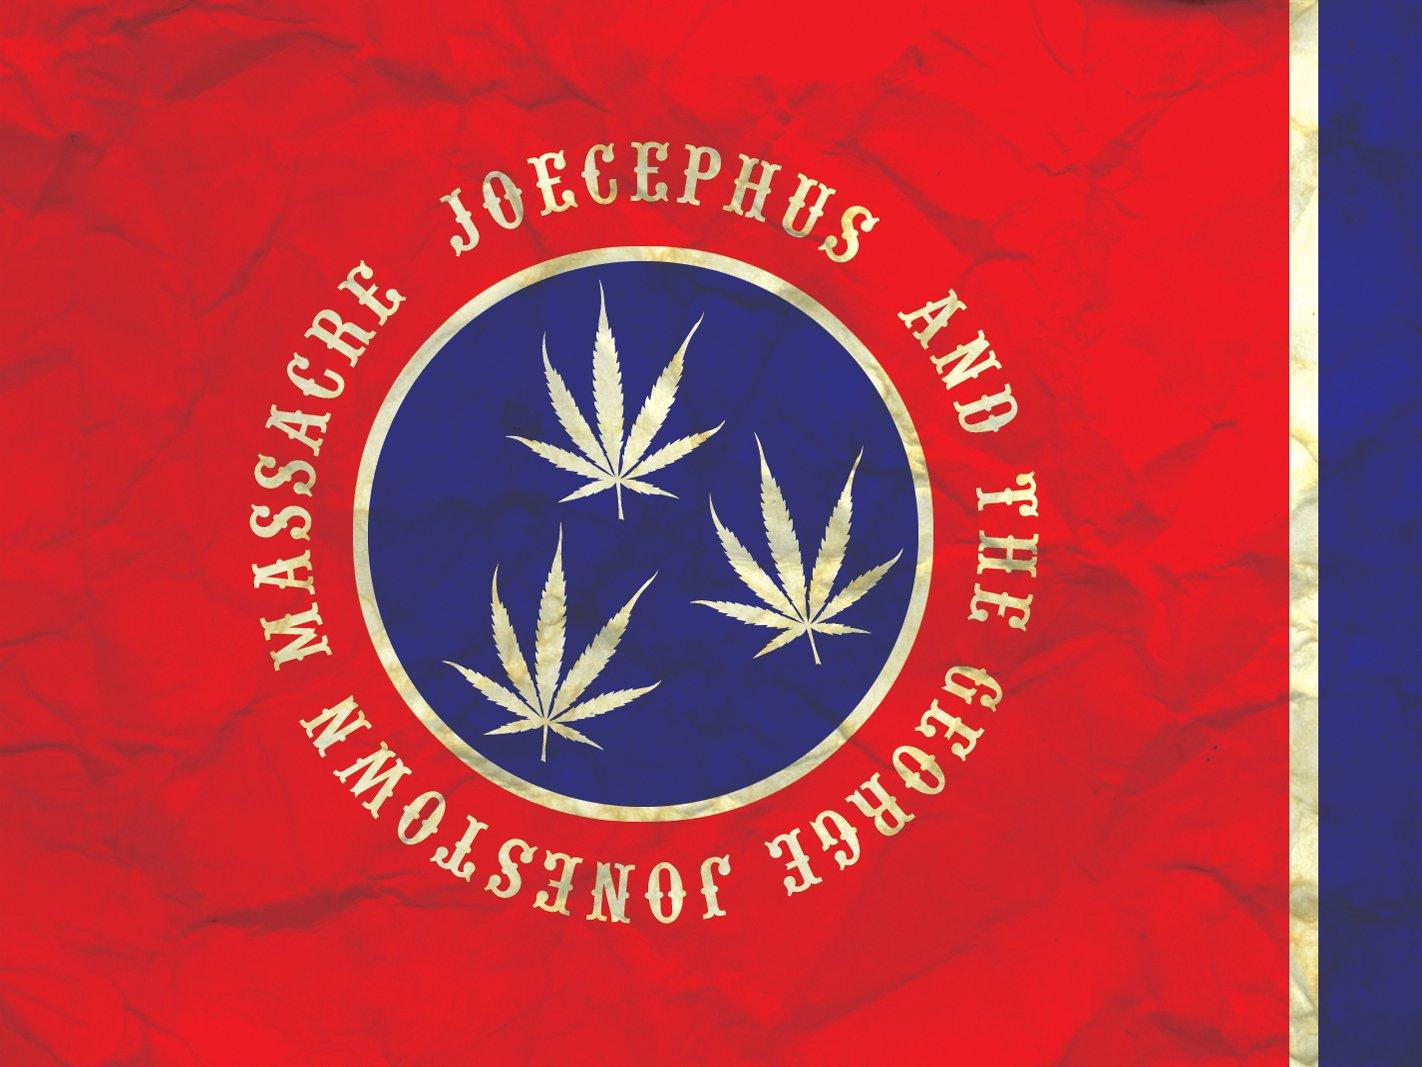 Image for Joecephus and The George Jonestown Massacre